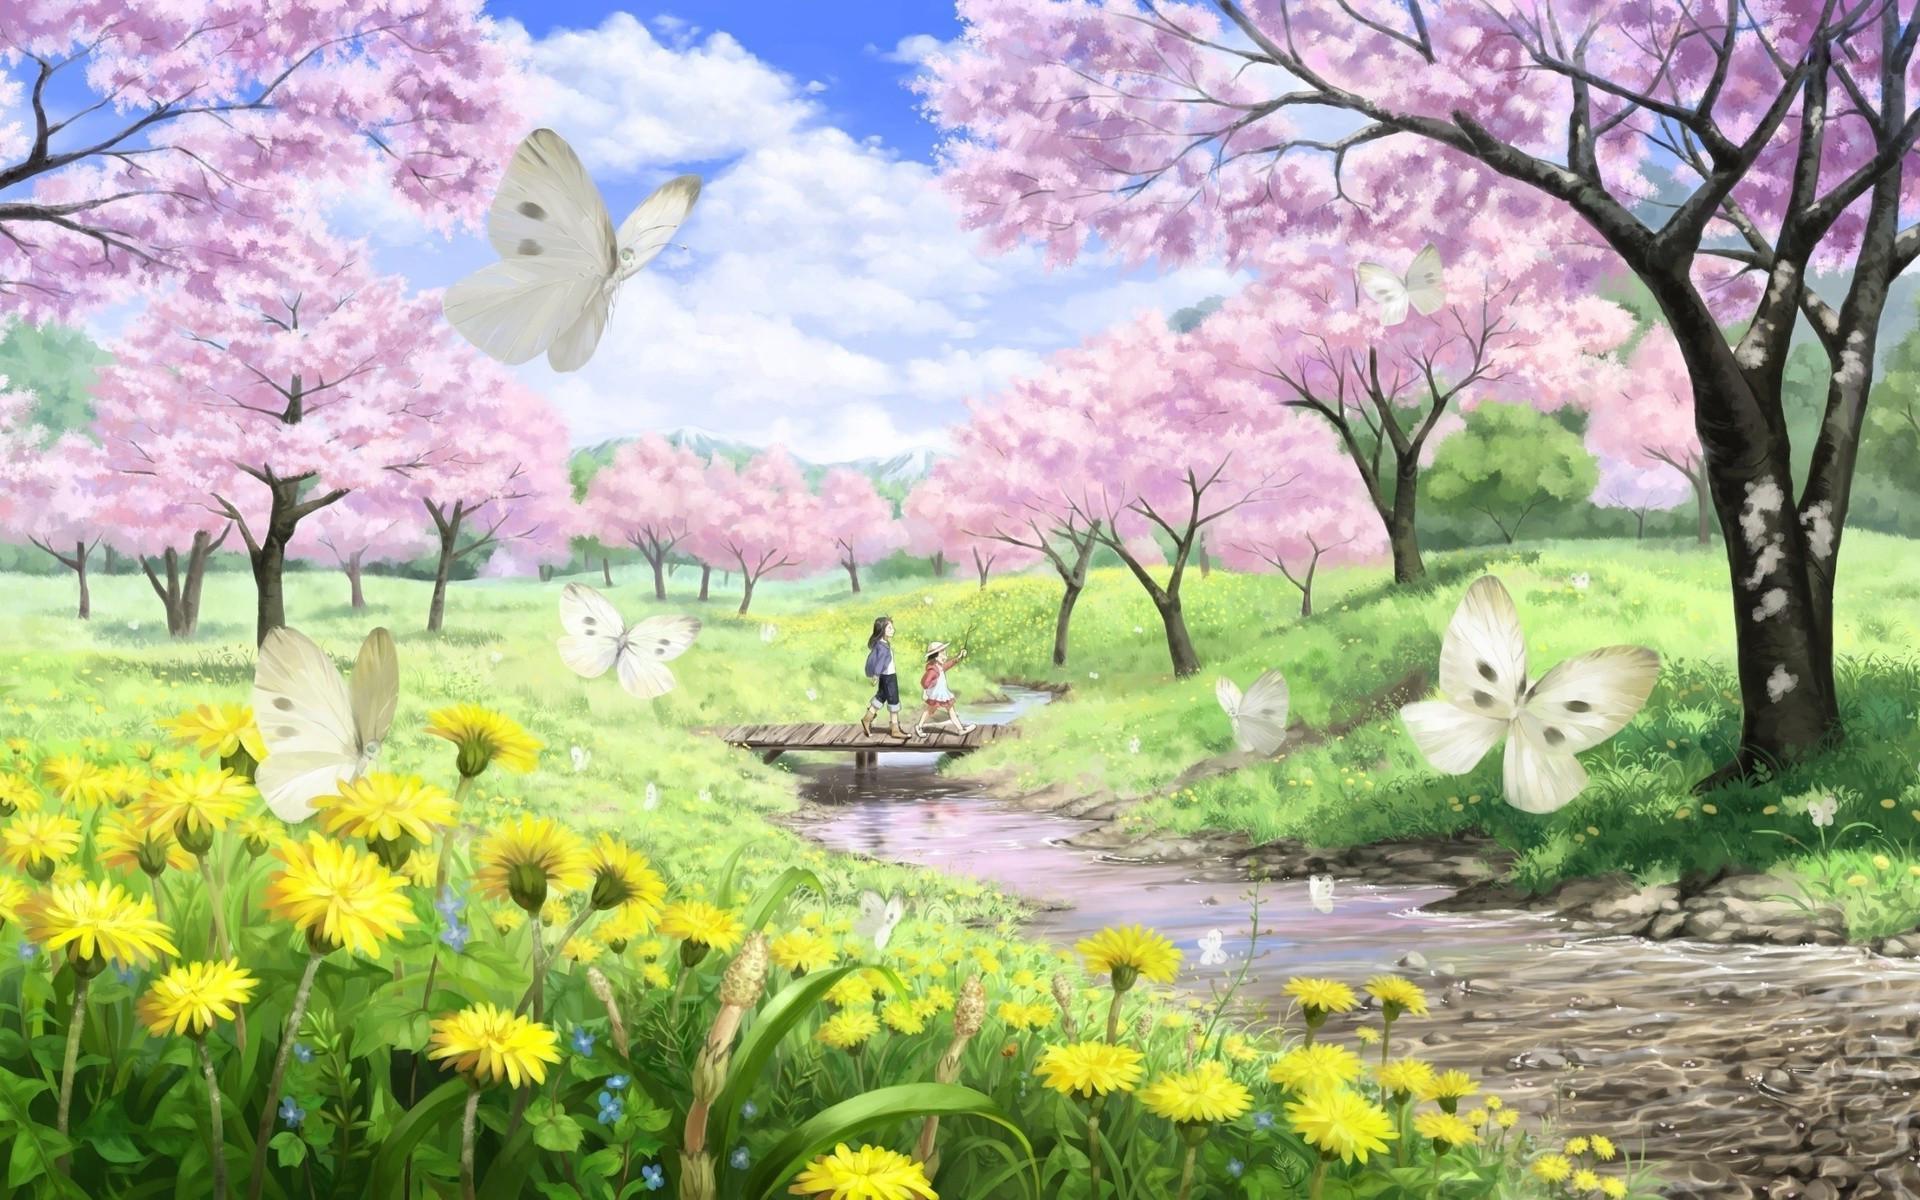 Springtime Wallpapers For Desktop 73 Pictures